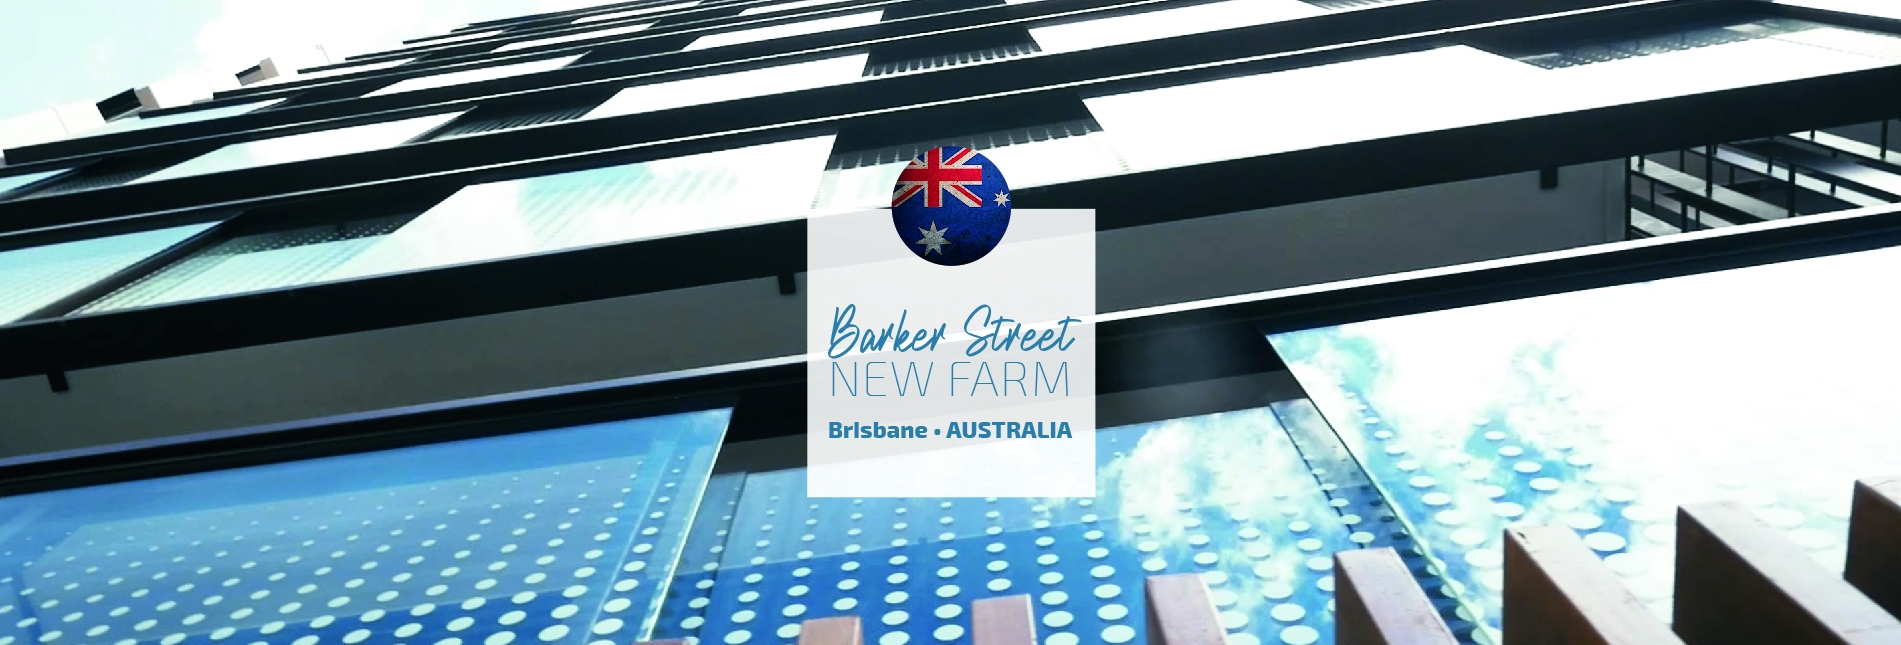 Barker st, New farm, Brisbane, Qld Australia